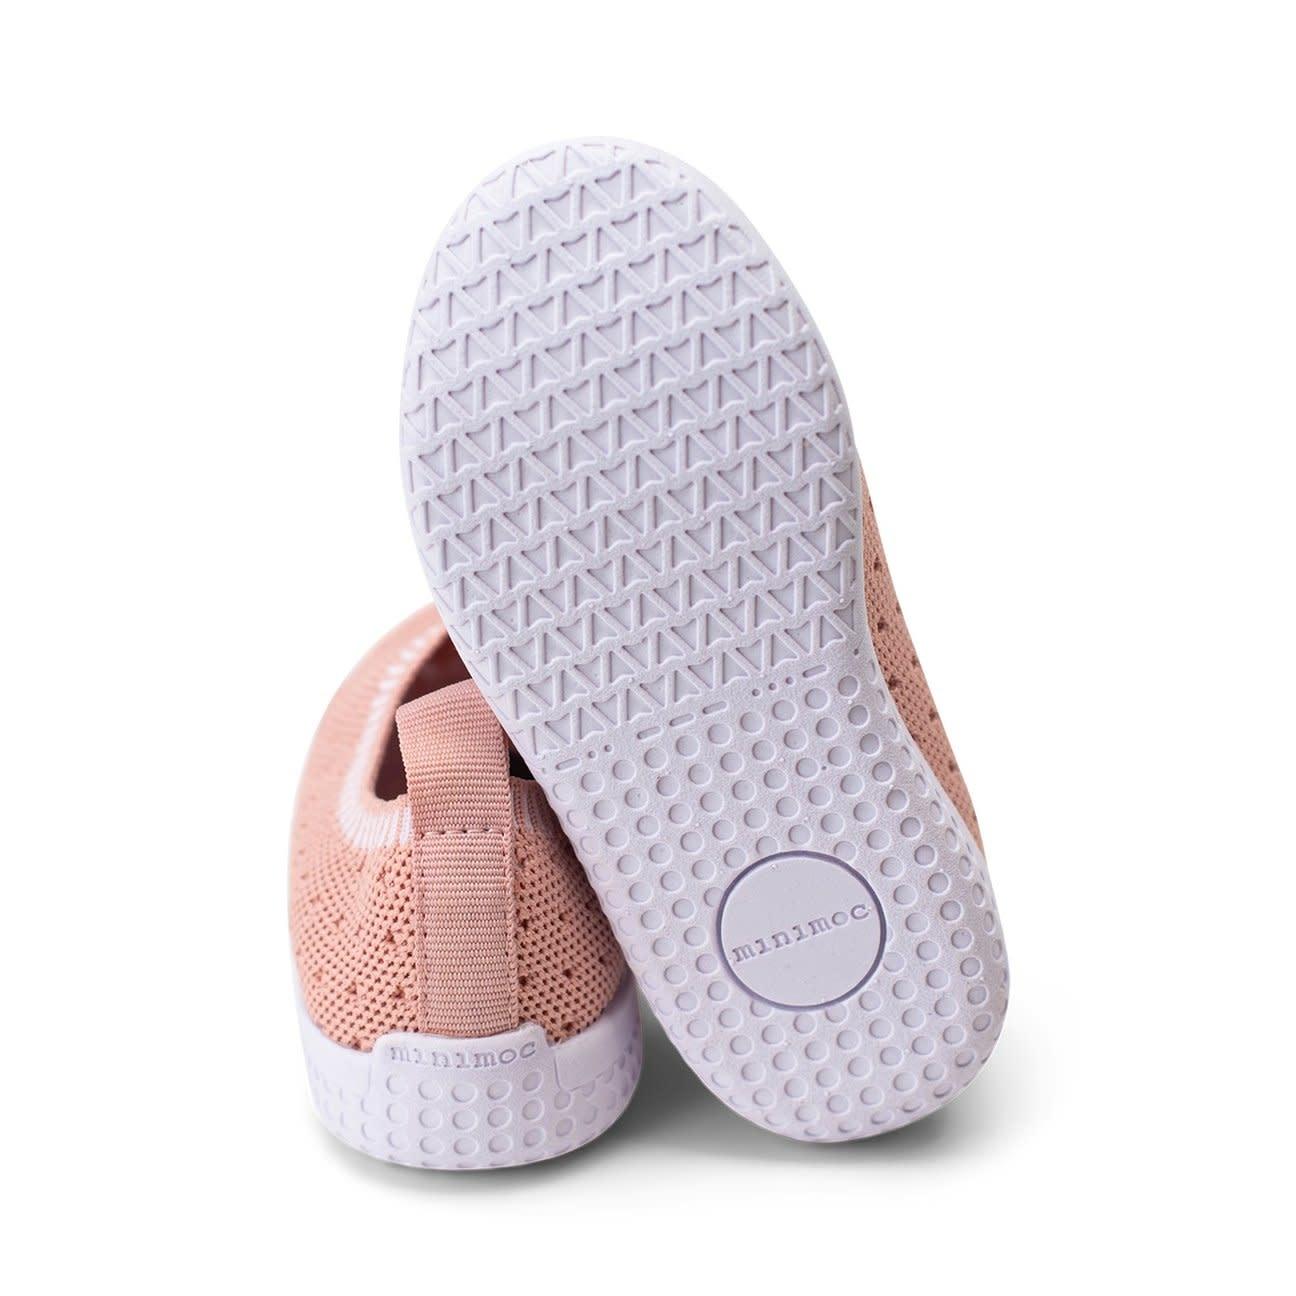 Minimoc Chaussures Victoria